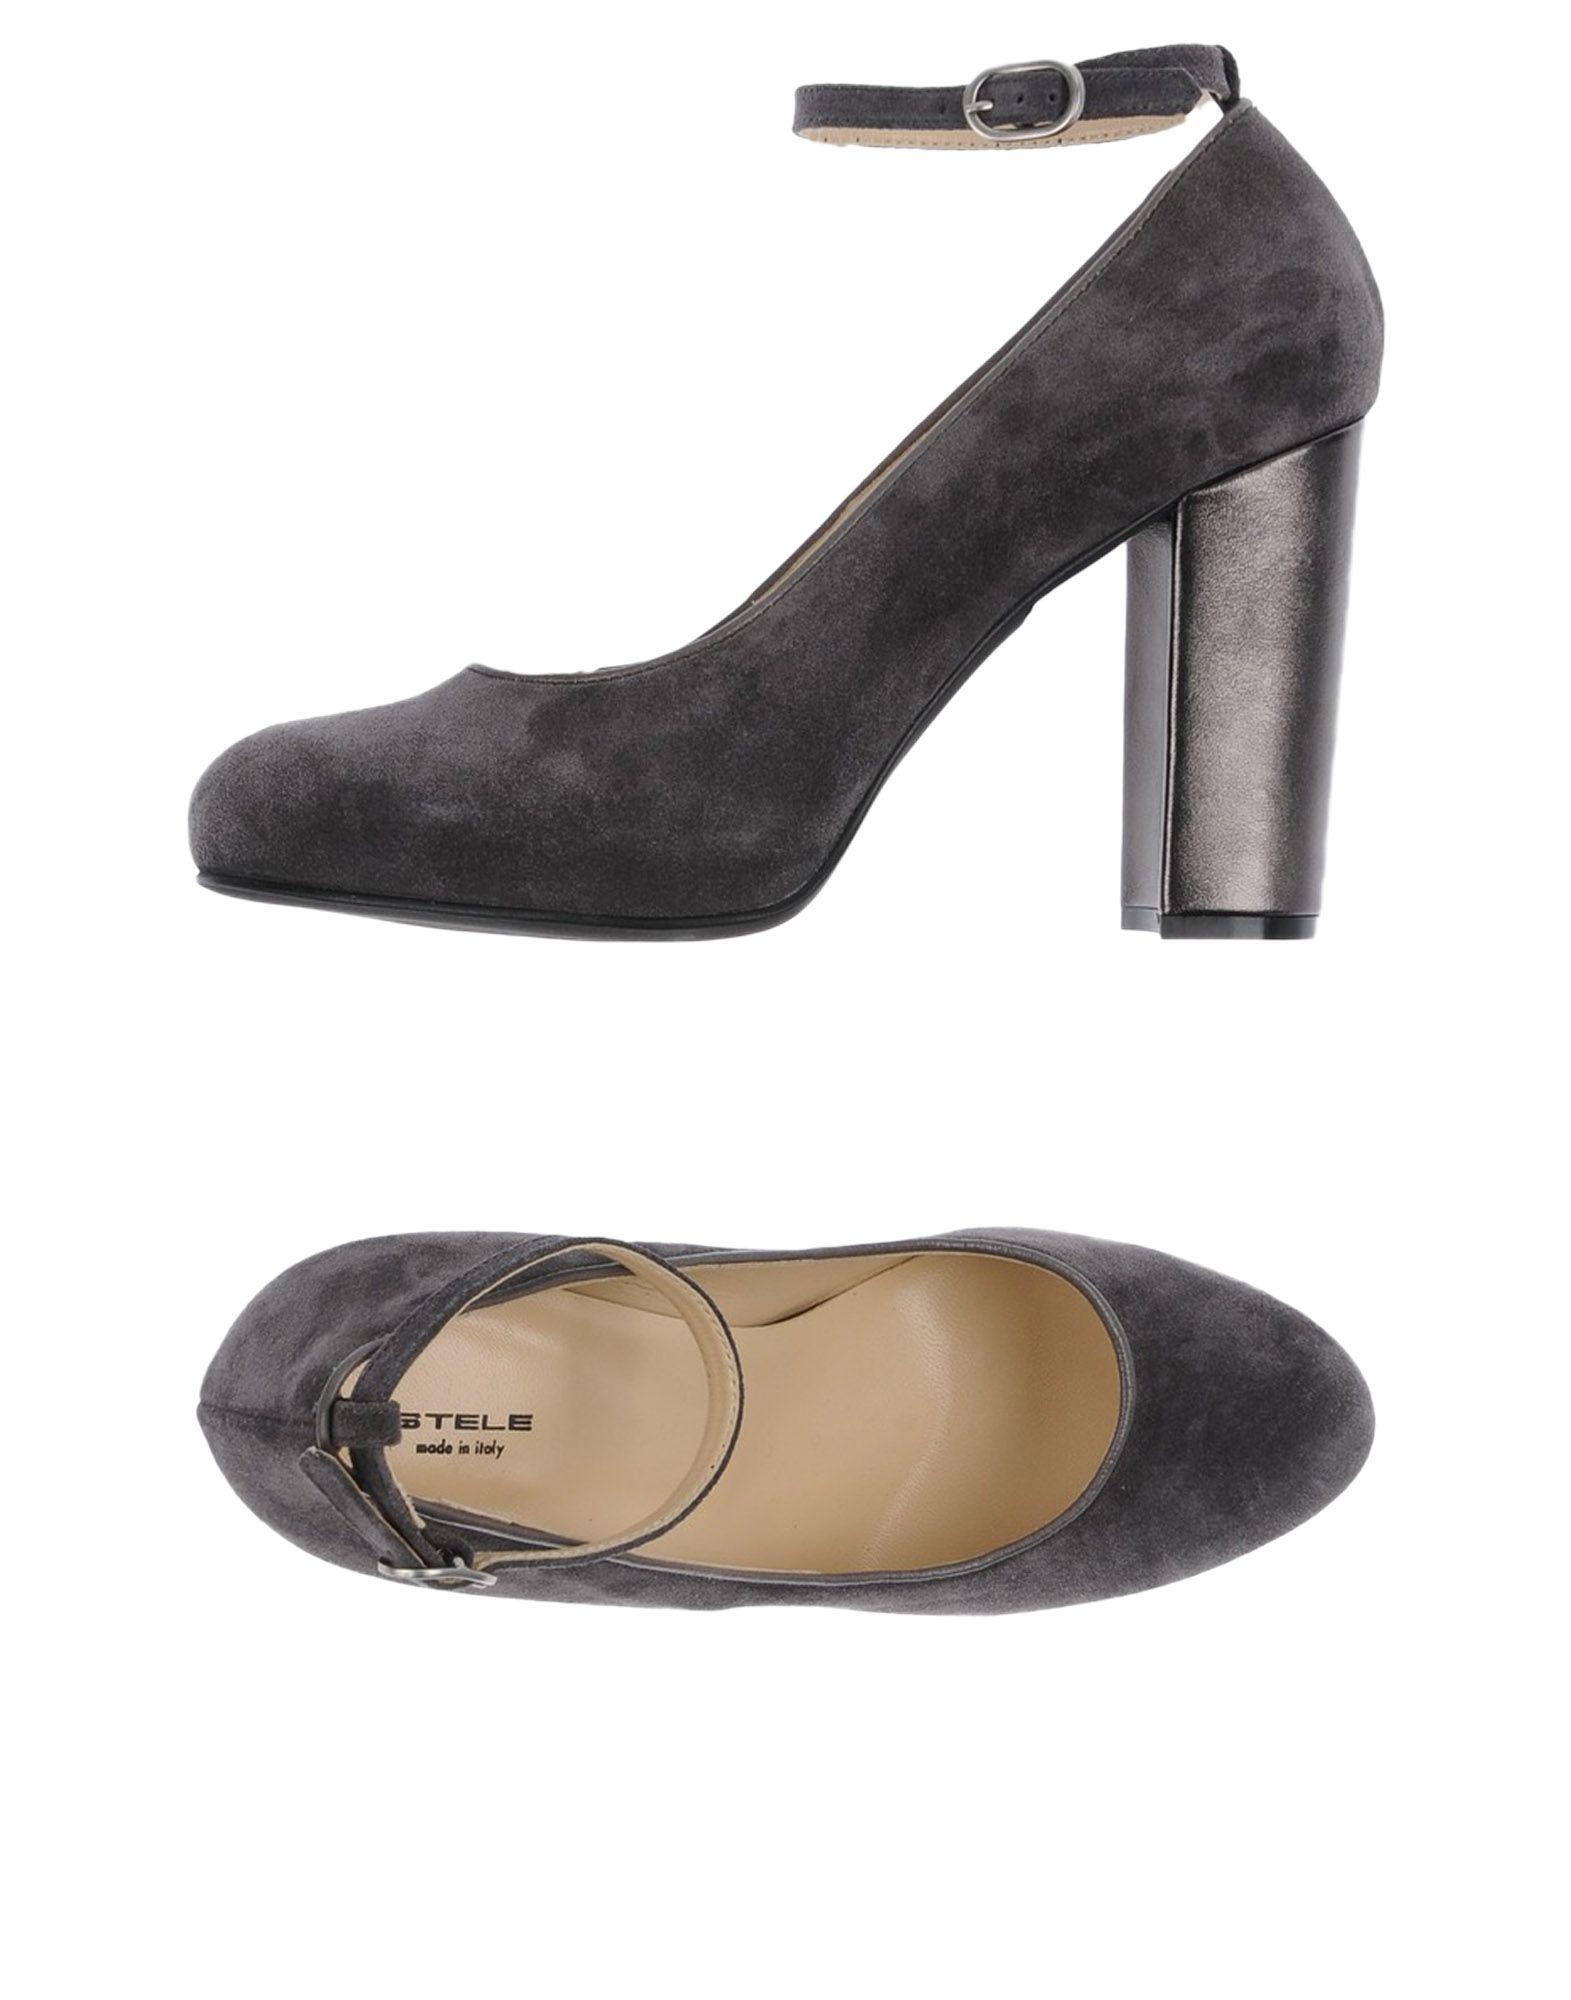 Stele Pumps Gute Damen  11454269PB Gute Pumps Qualität beliebte Schuhe 28dd3c